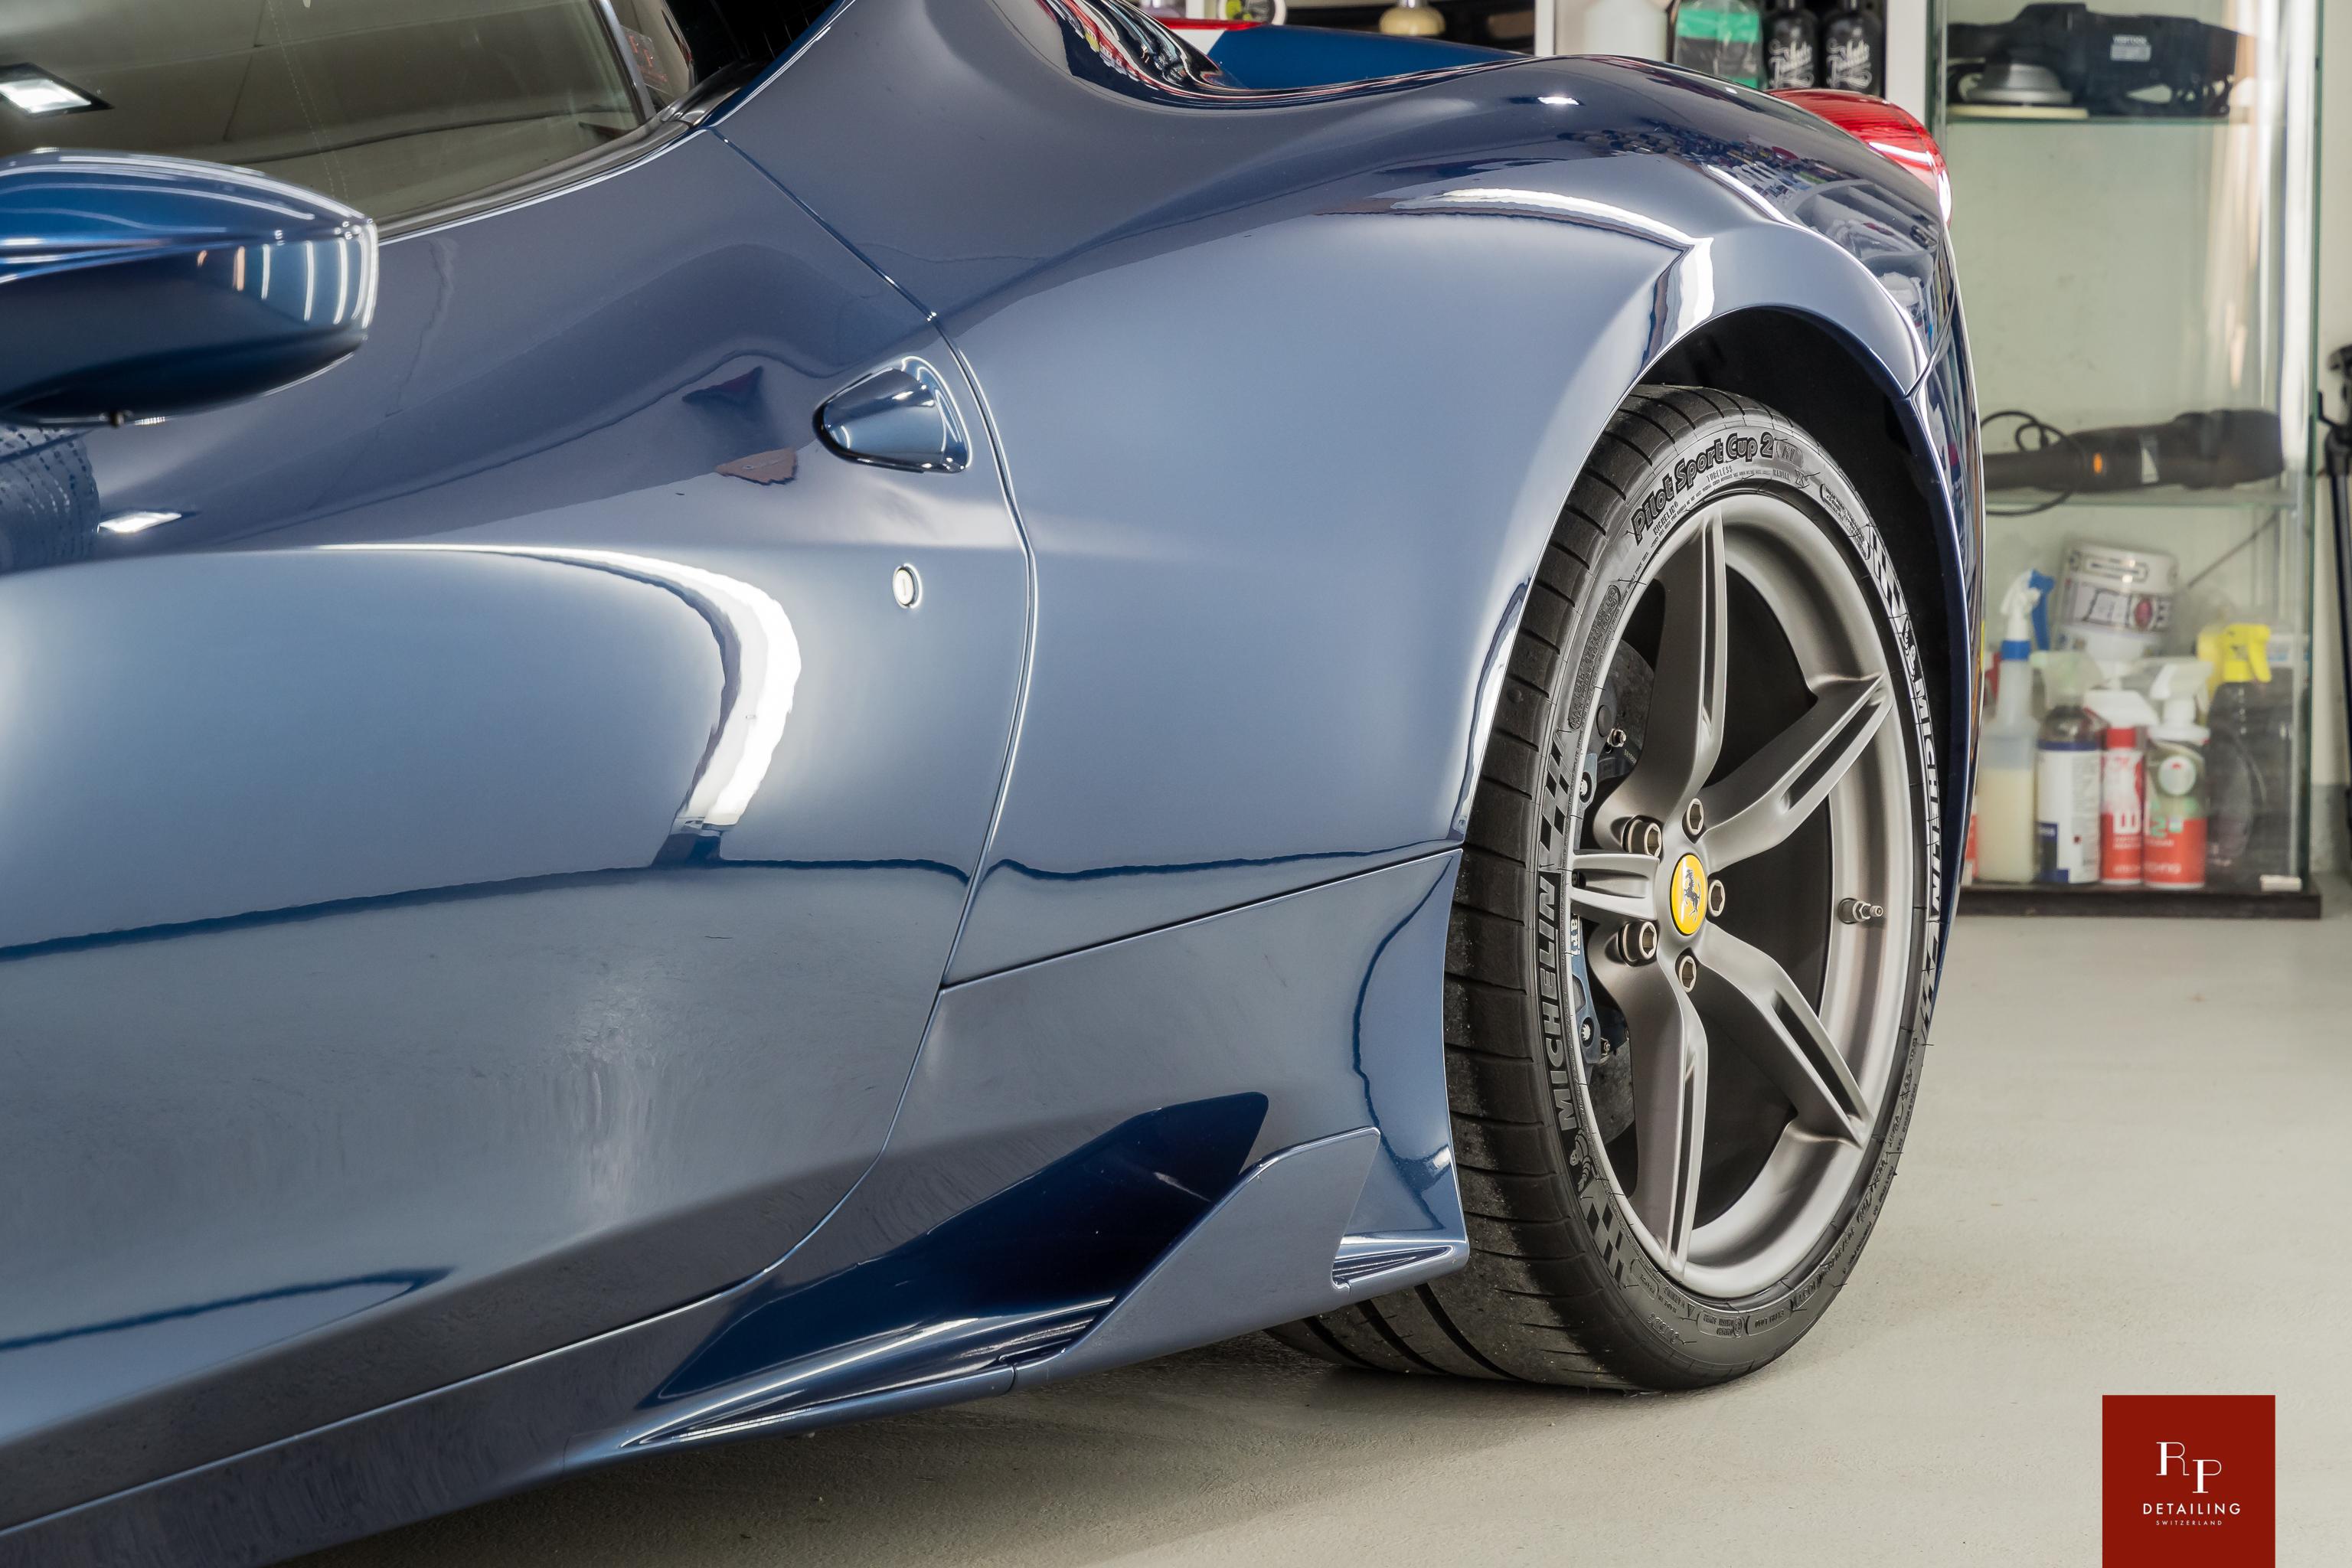 Ferrari%20Speciale%20RP%206.jpg